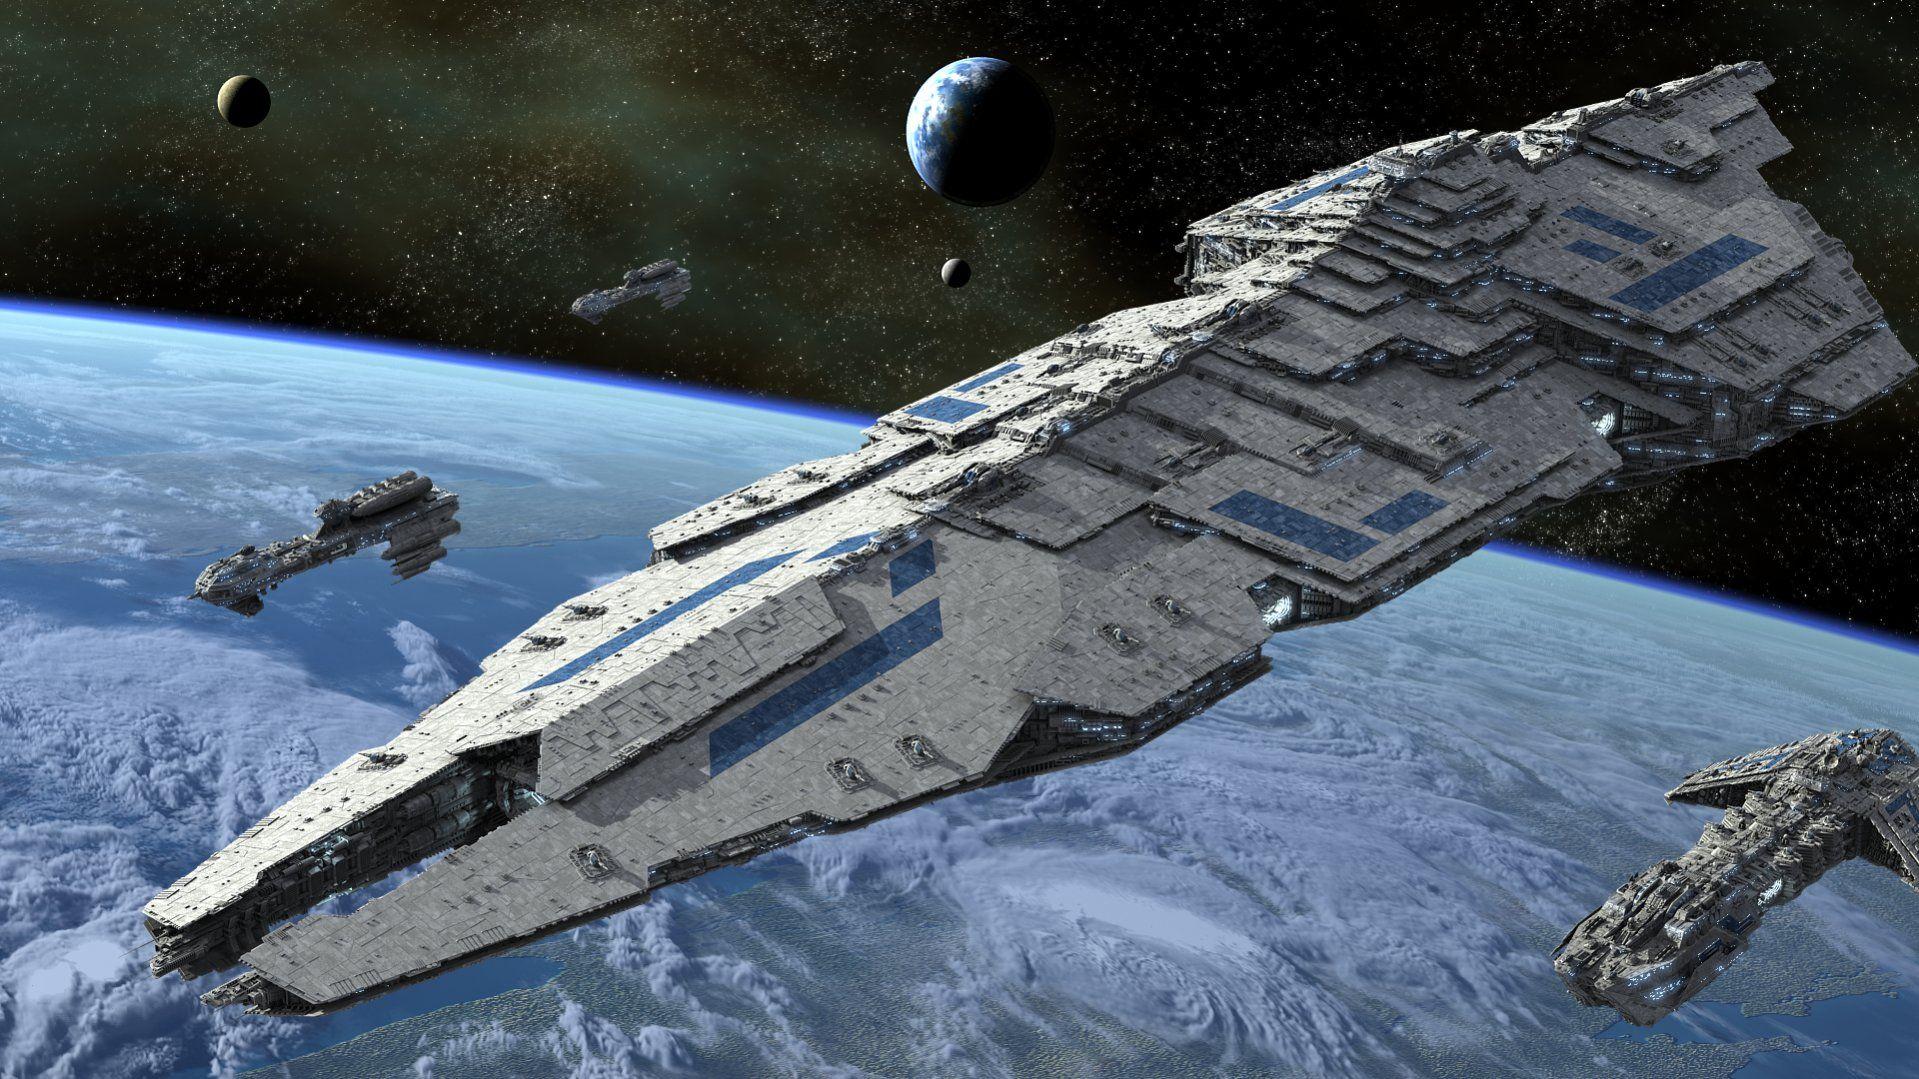 Sci-Fi Cruiser Book Cover by AdamKop on DeviantArt